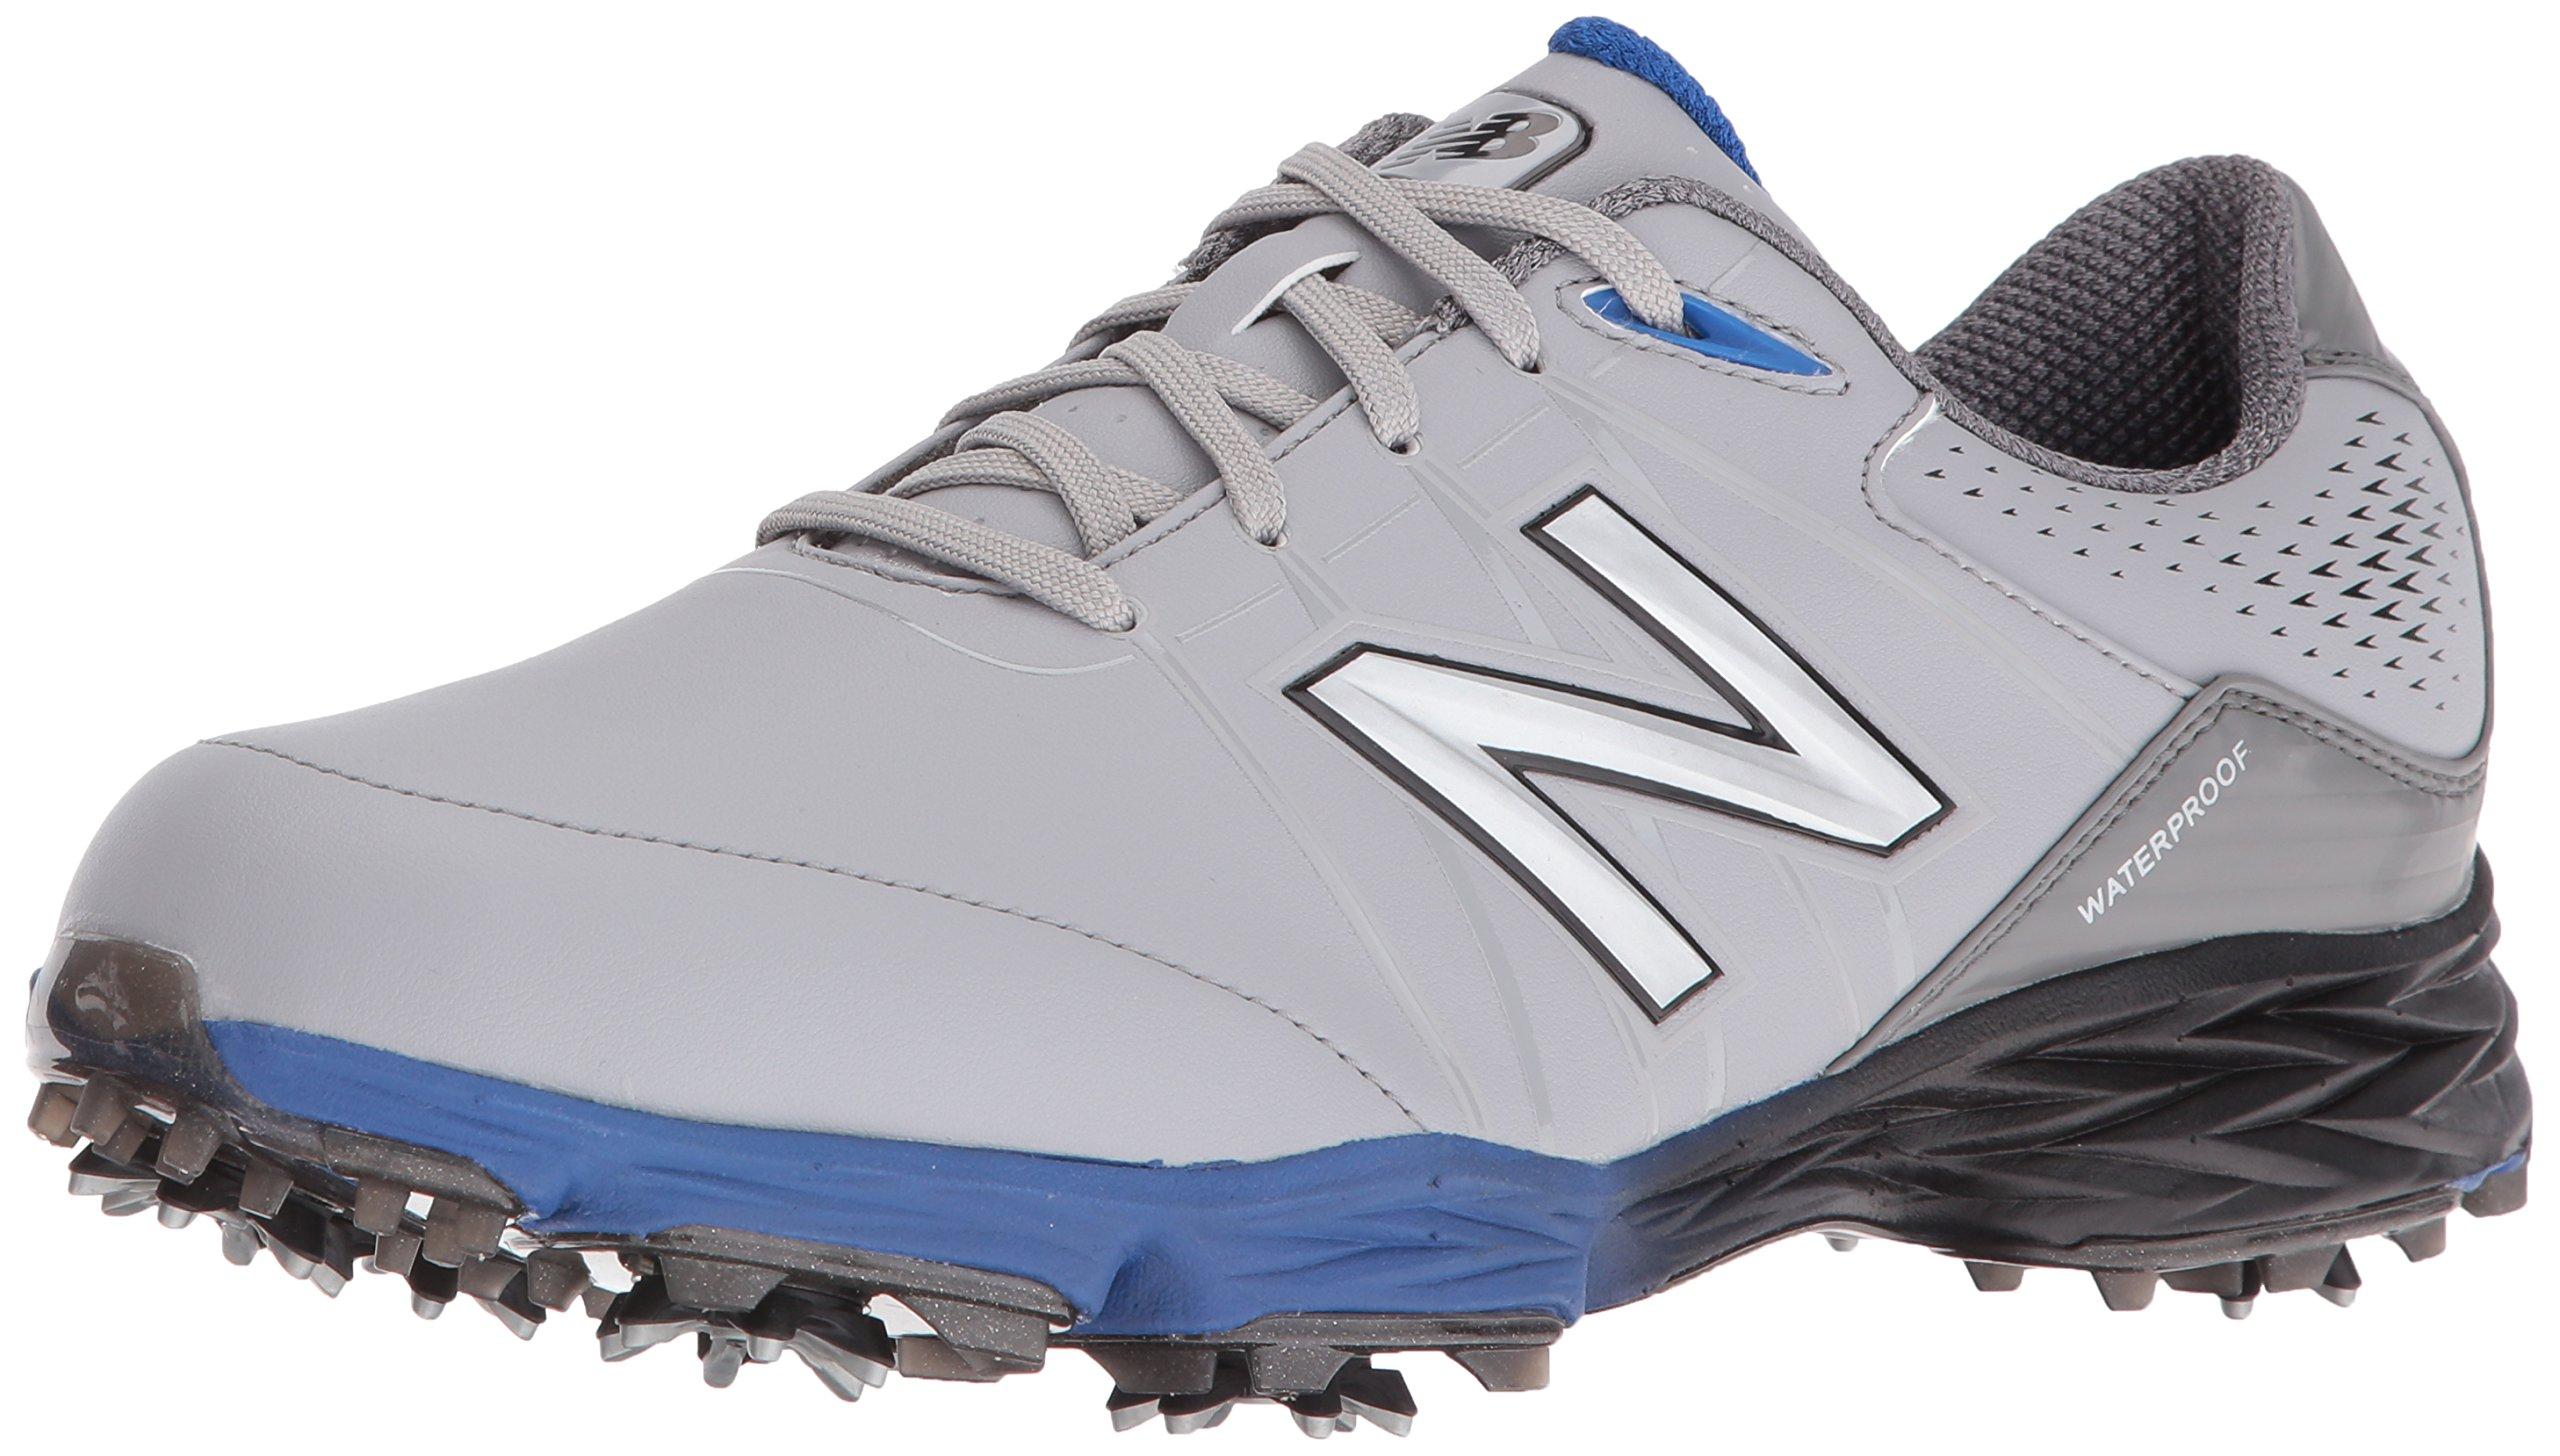 New Balance Men's nbg2004 Golf Shoe, Grey/Blue, 10.5 D US by New Balance